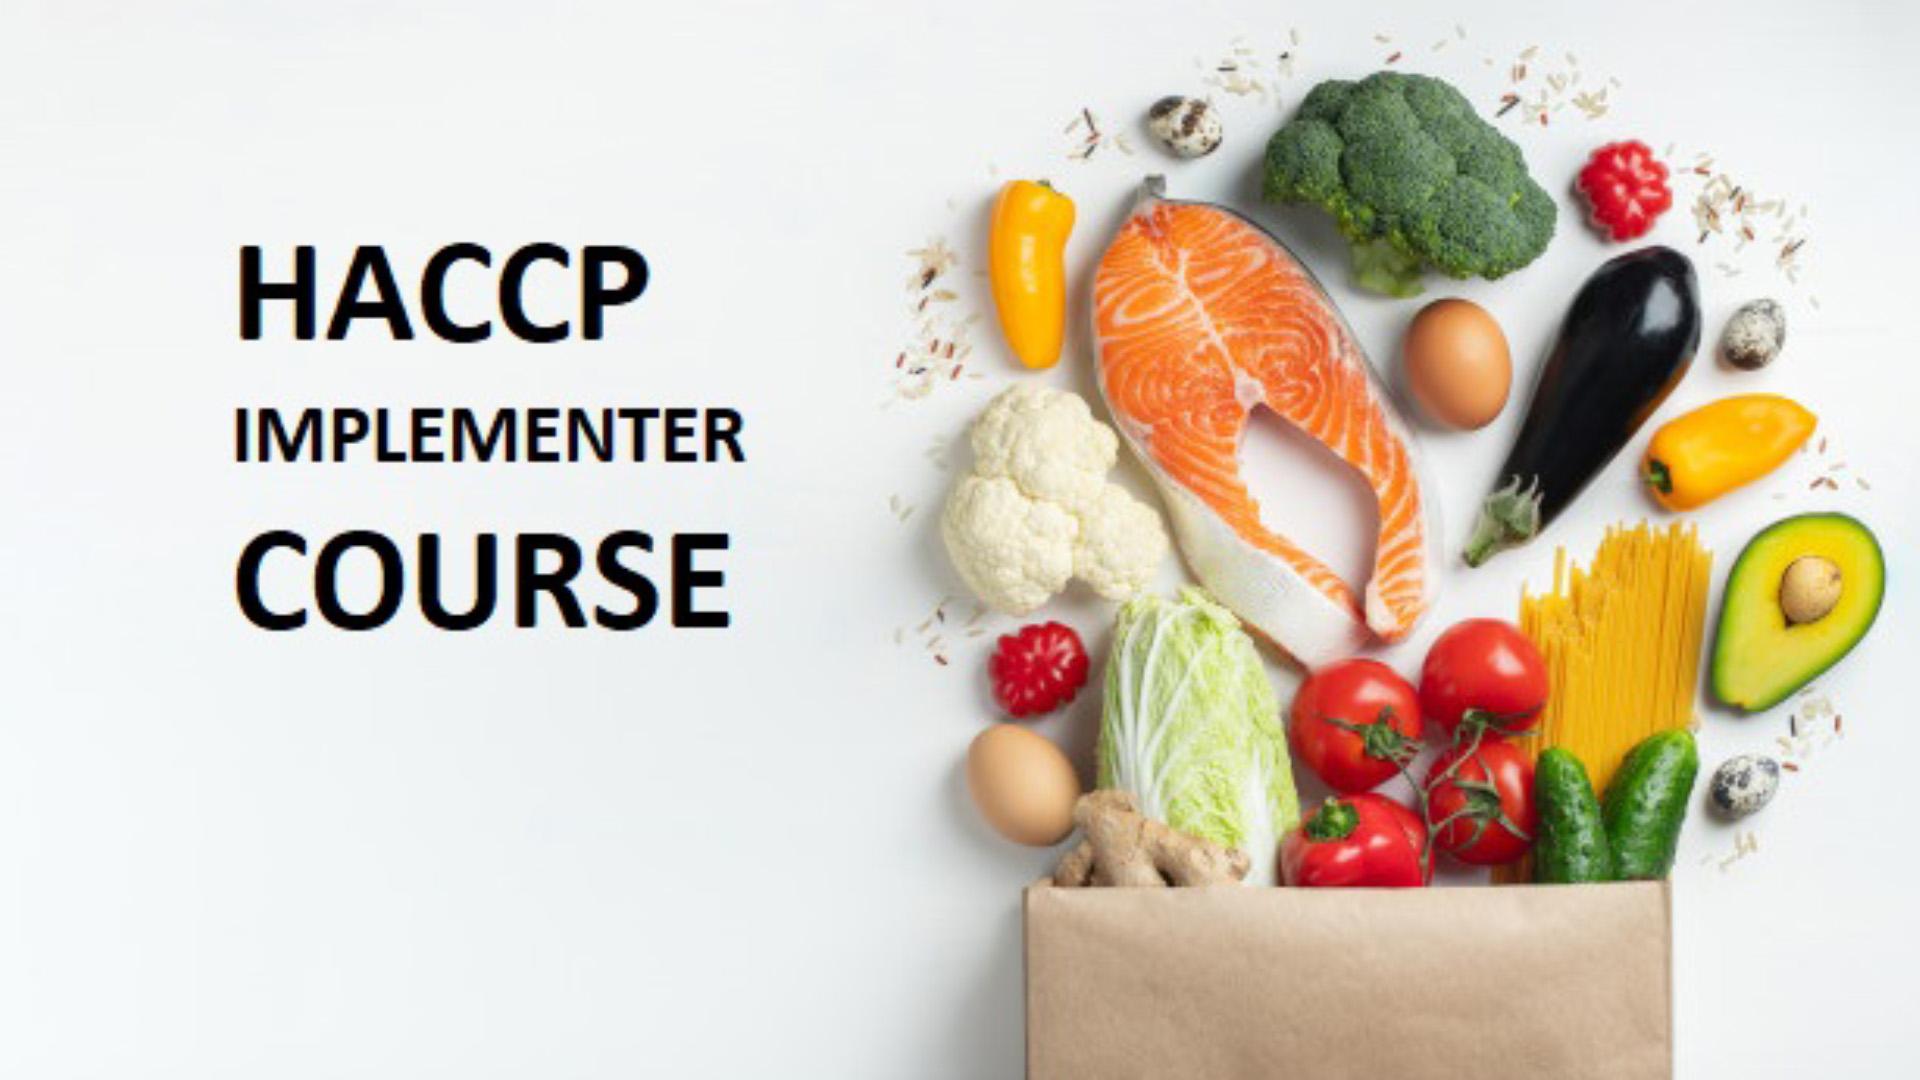 HACCP Implementer Course